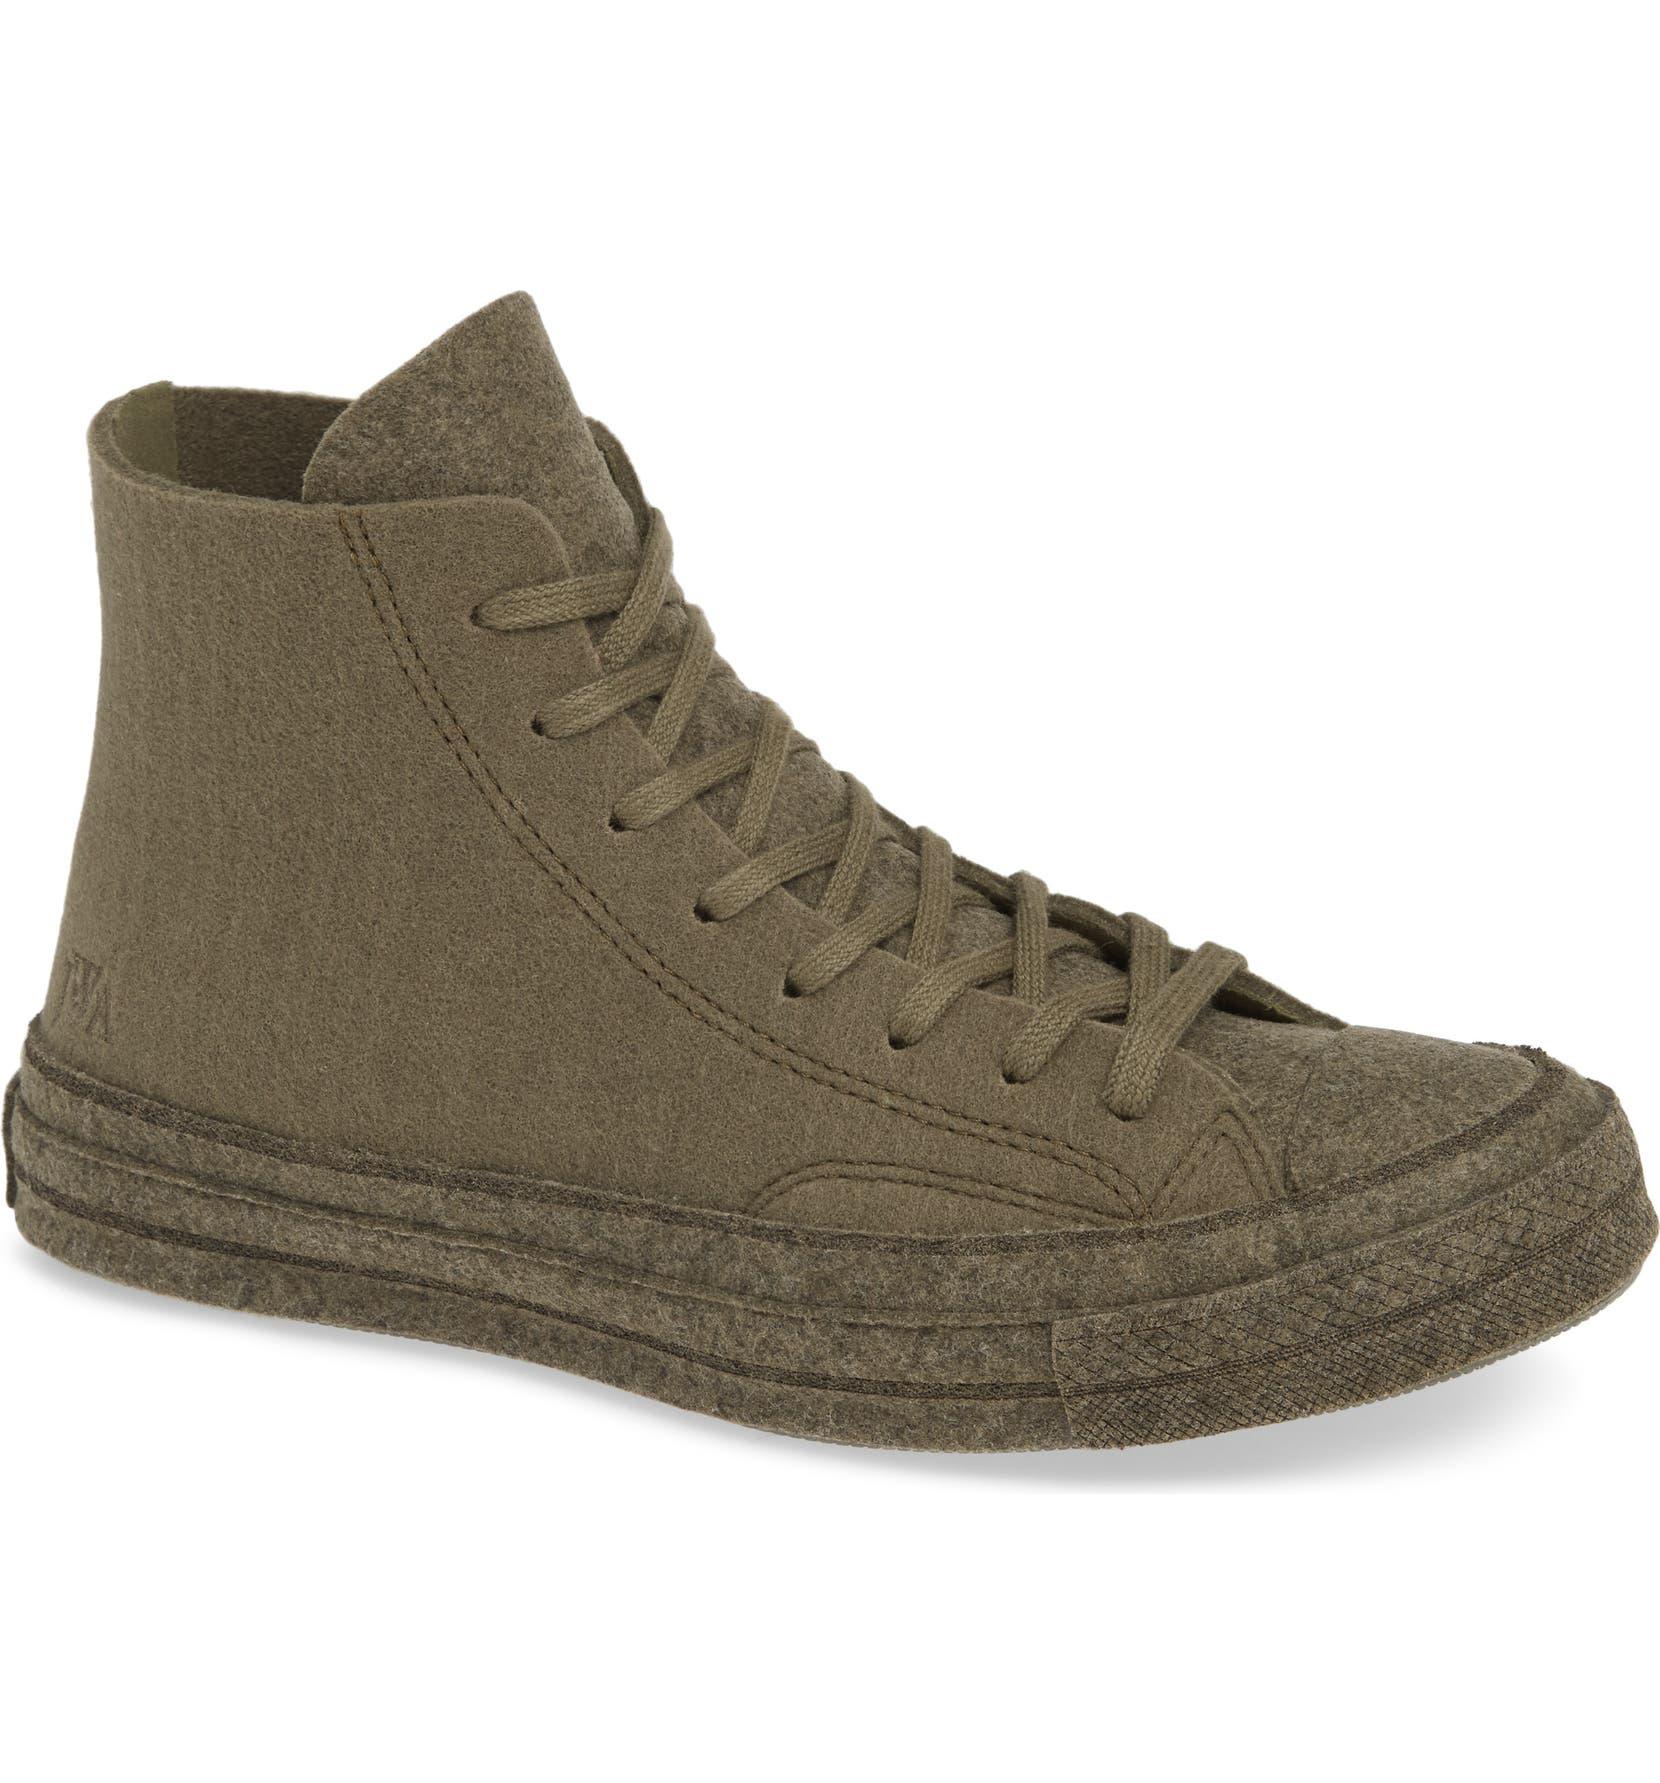 5d2a16273fce6a Converse x JW Anderson Chuck Taylor® All Star® Felt 70 Sneaker (Men ...